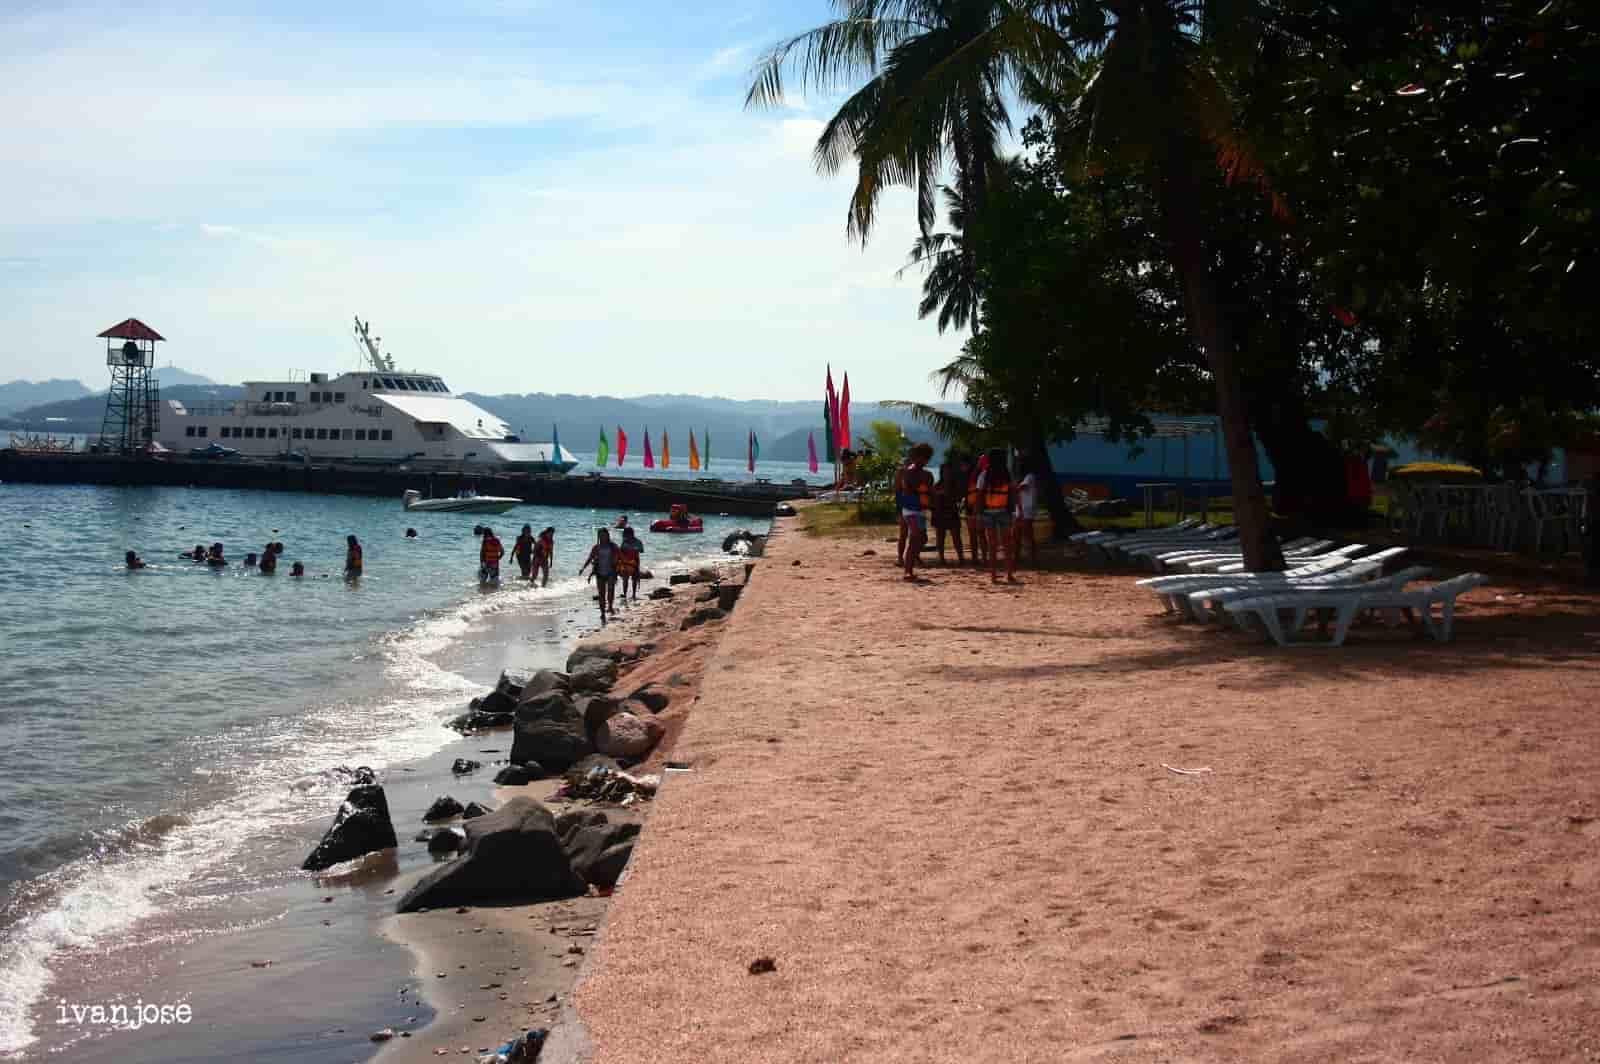 The segment of the beach near the port at Grande Island Resort